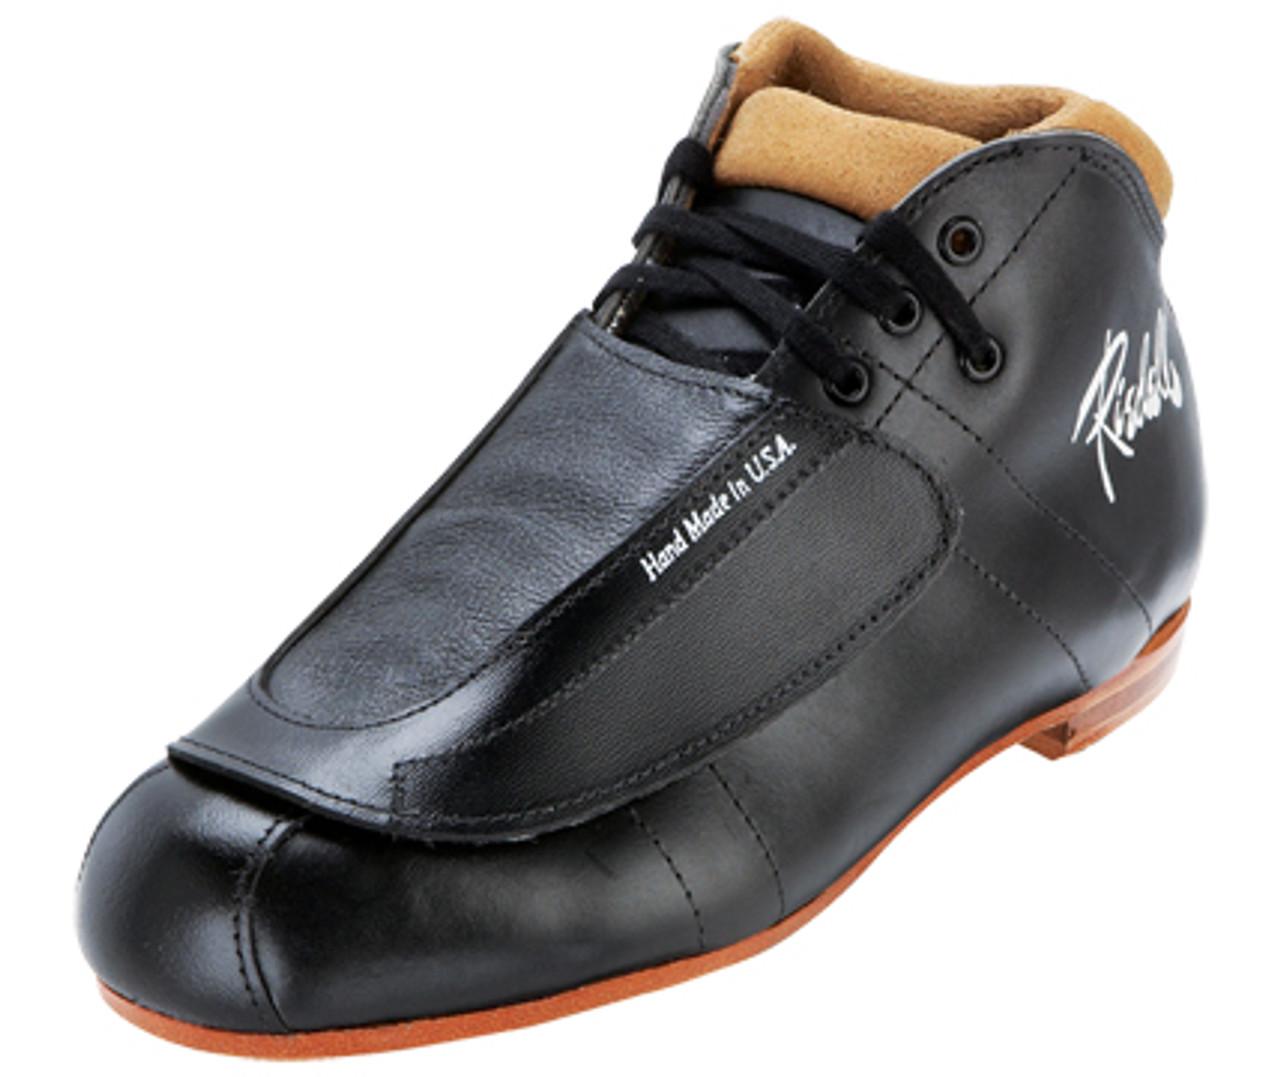 Riedell 965 Minx Boot